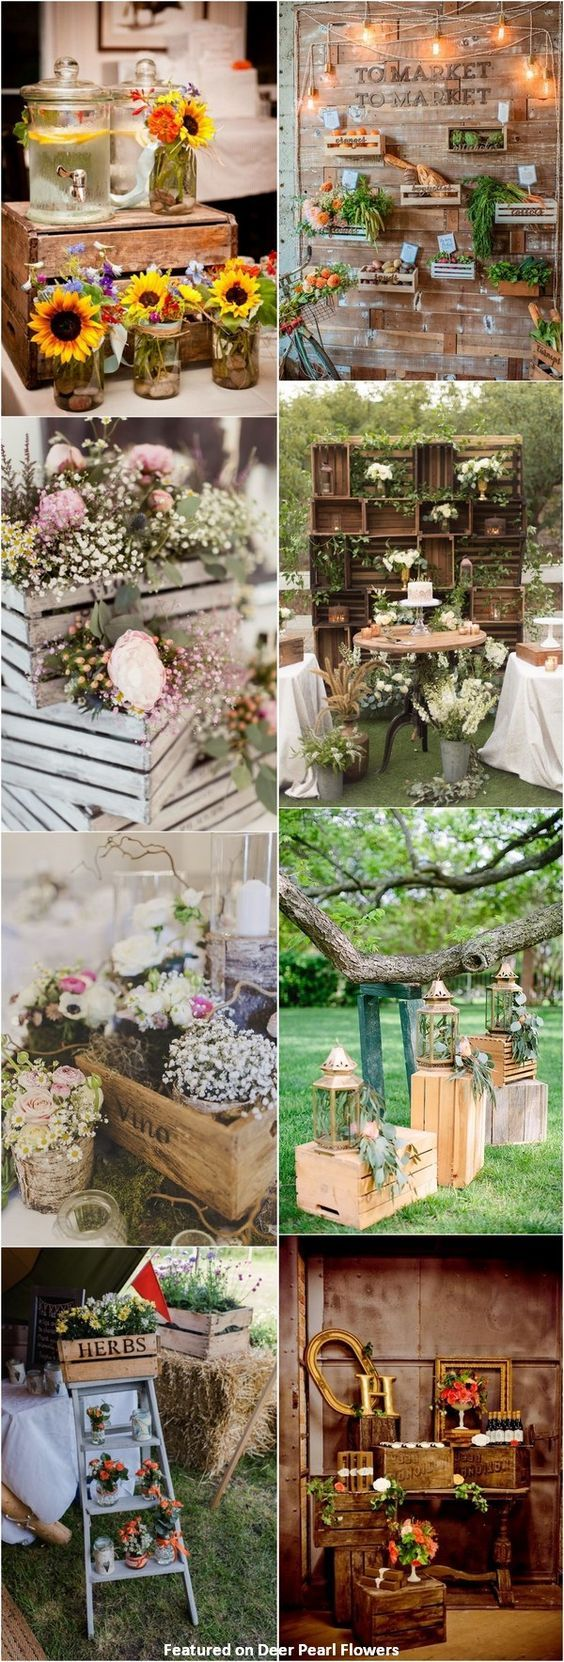 best weddings idea images on pinterest gardening mini